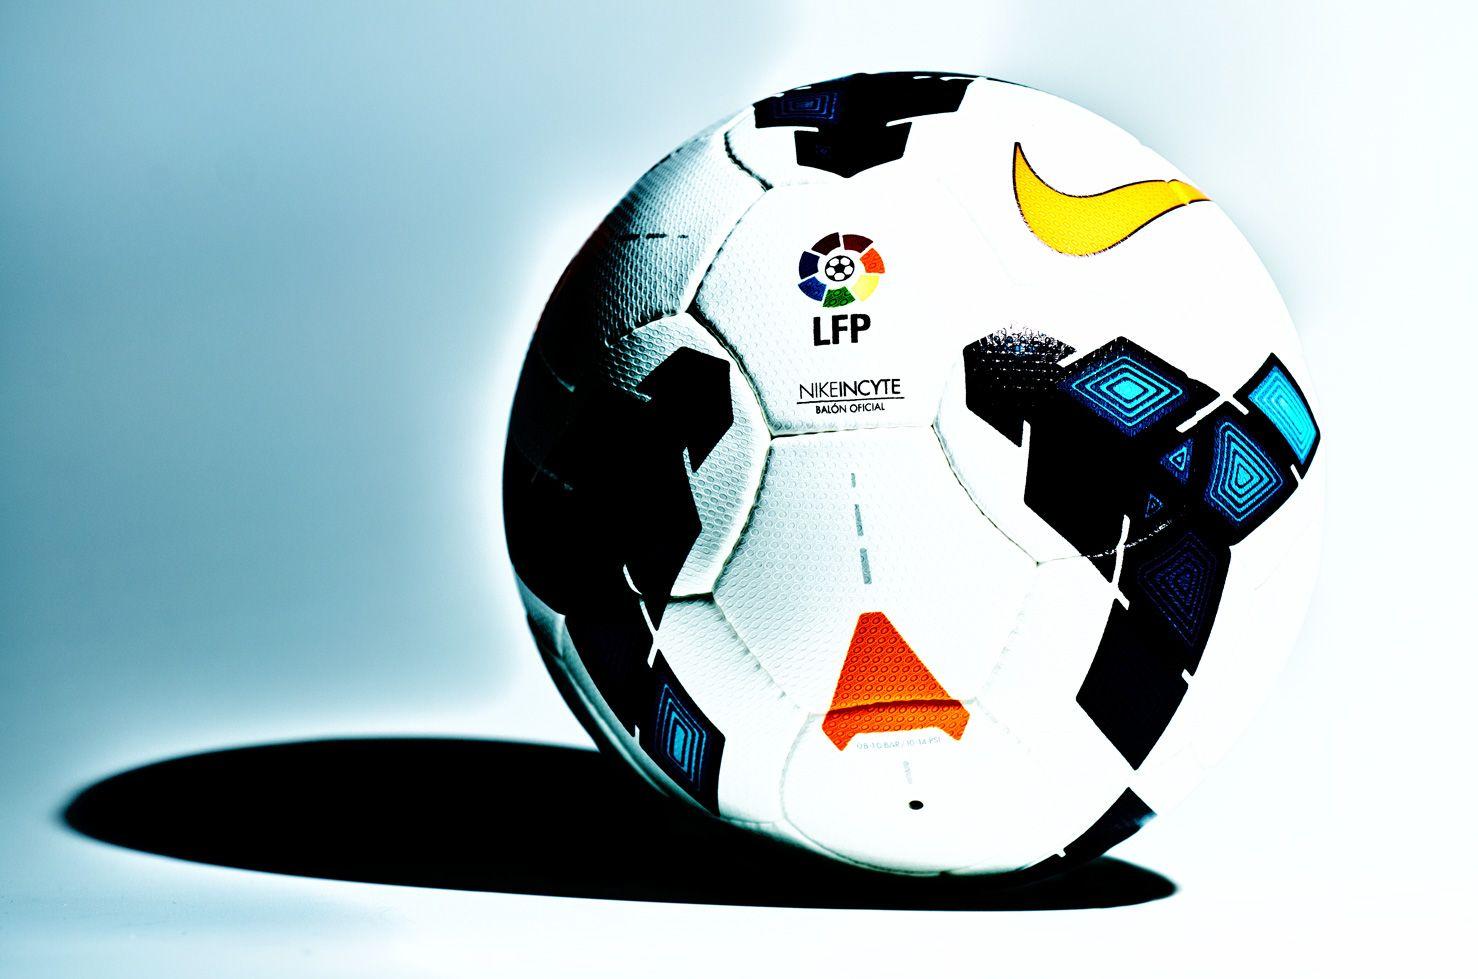 Nike Incyte Official LFP (La Liga) Match Ball... 134.99 Soccer Cleats 27401eba91a5e